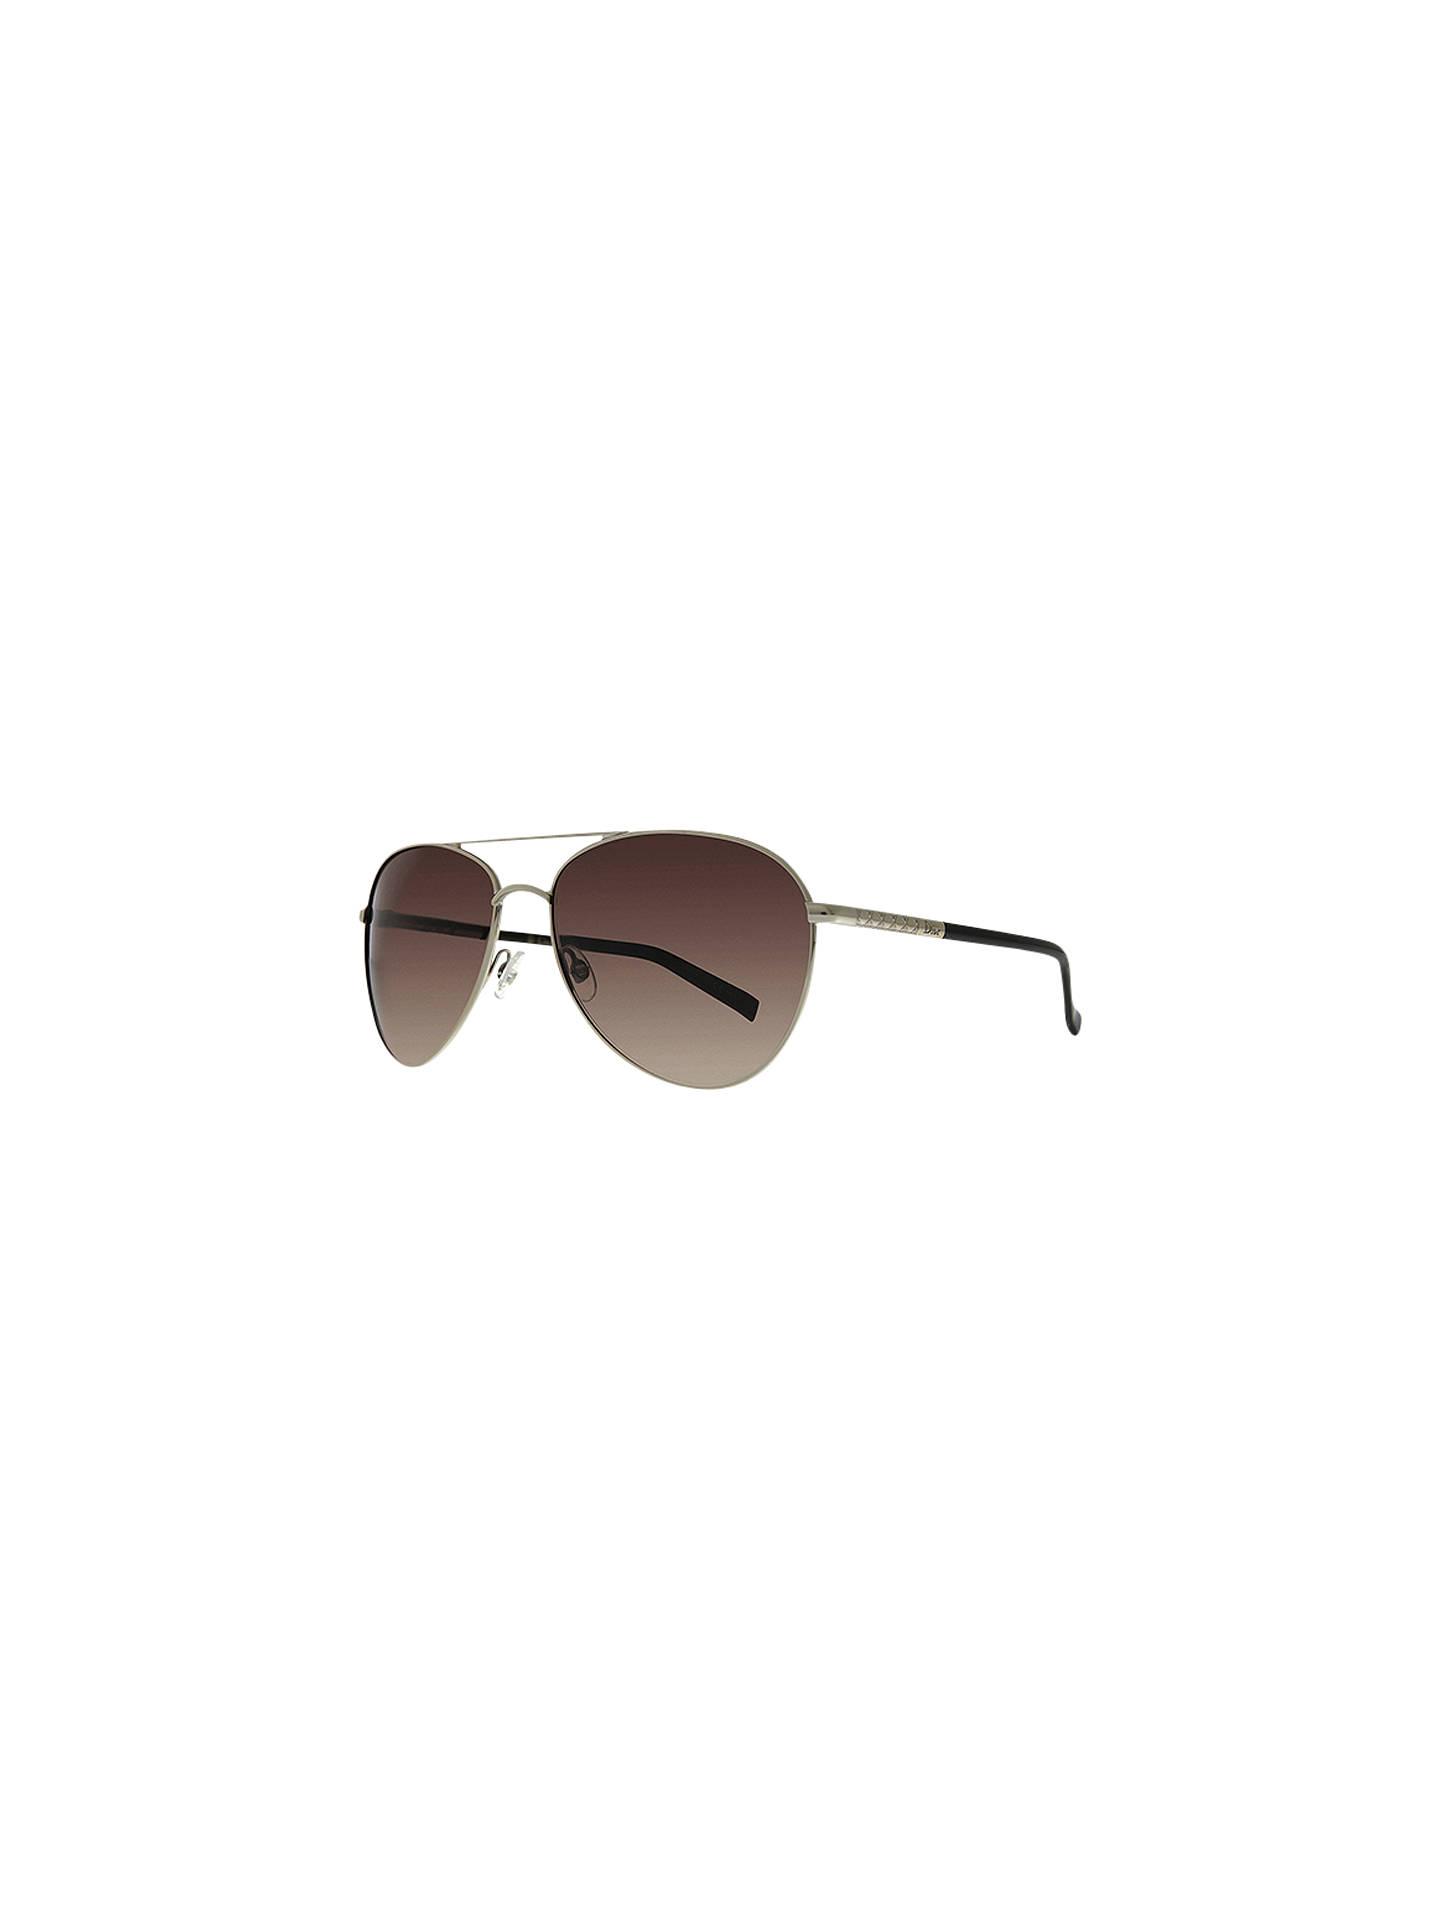 aec7f5614e0a Buy Christian Dior Piccadilly 2 Aviator Sunglasses, Light Gold Online at  johnlewis.com ...